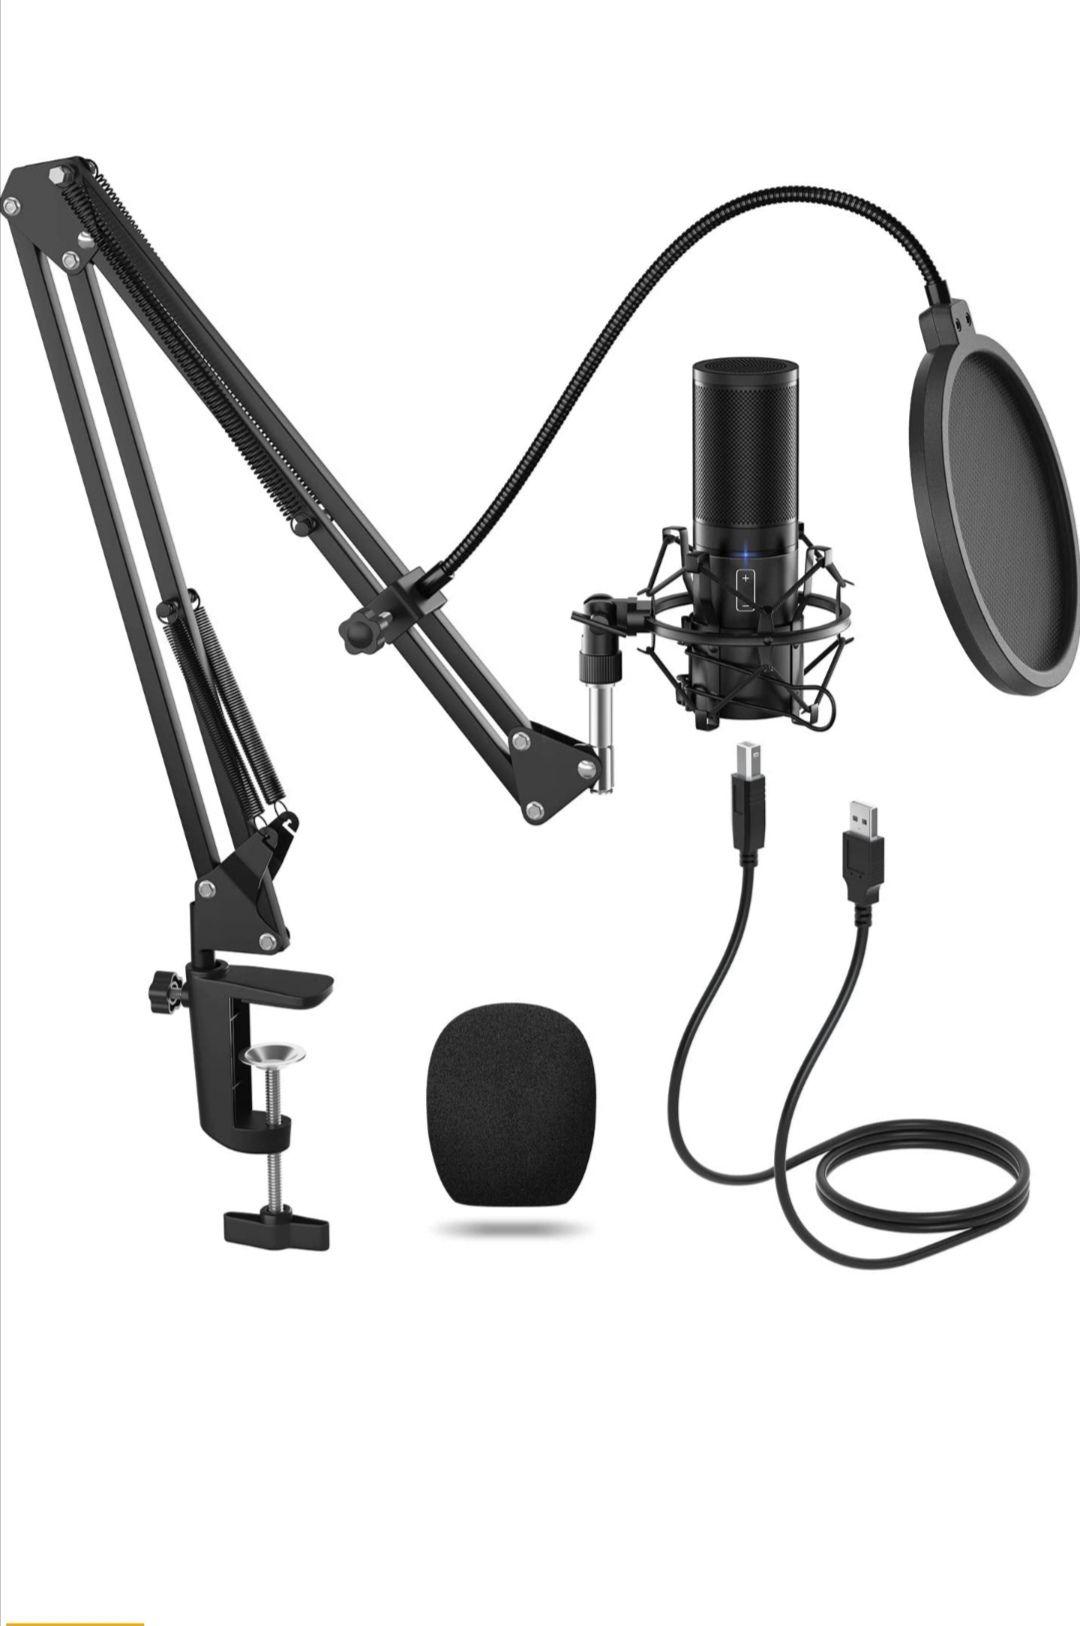 TONOR USB Microfoon kit